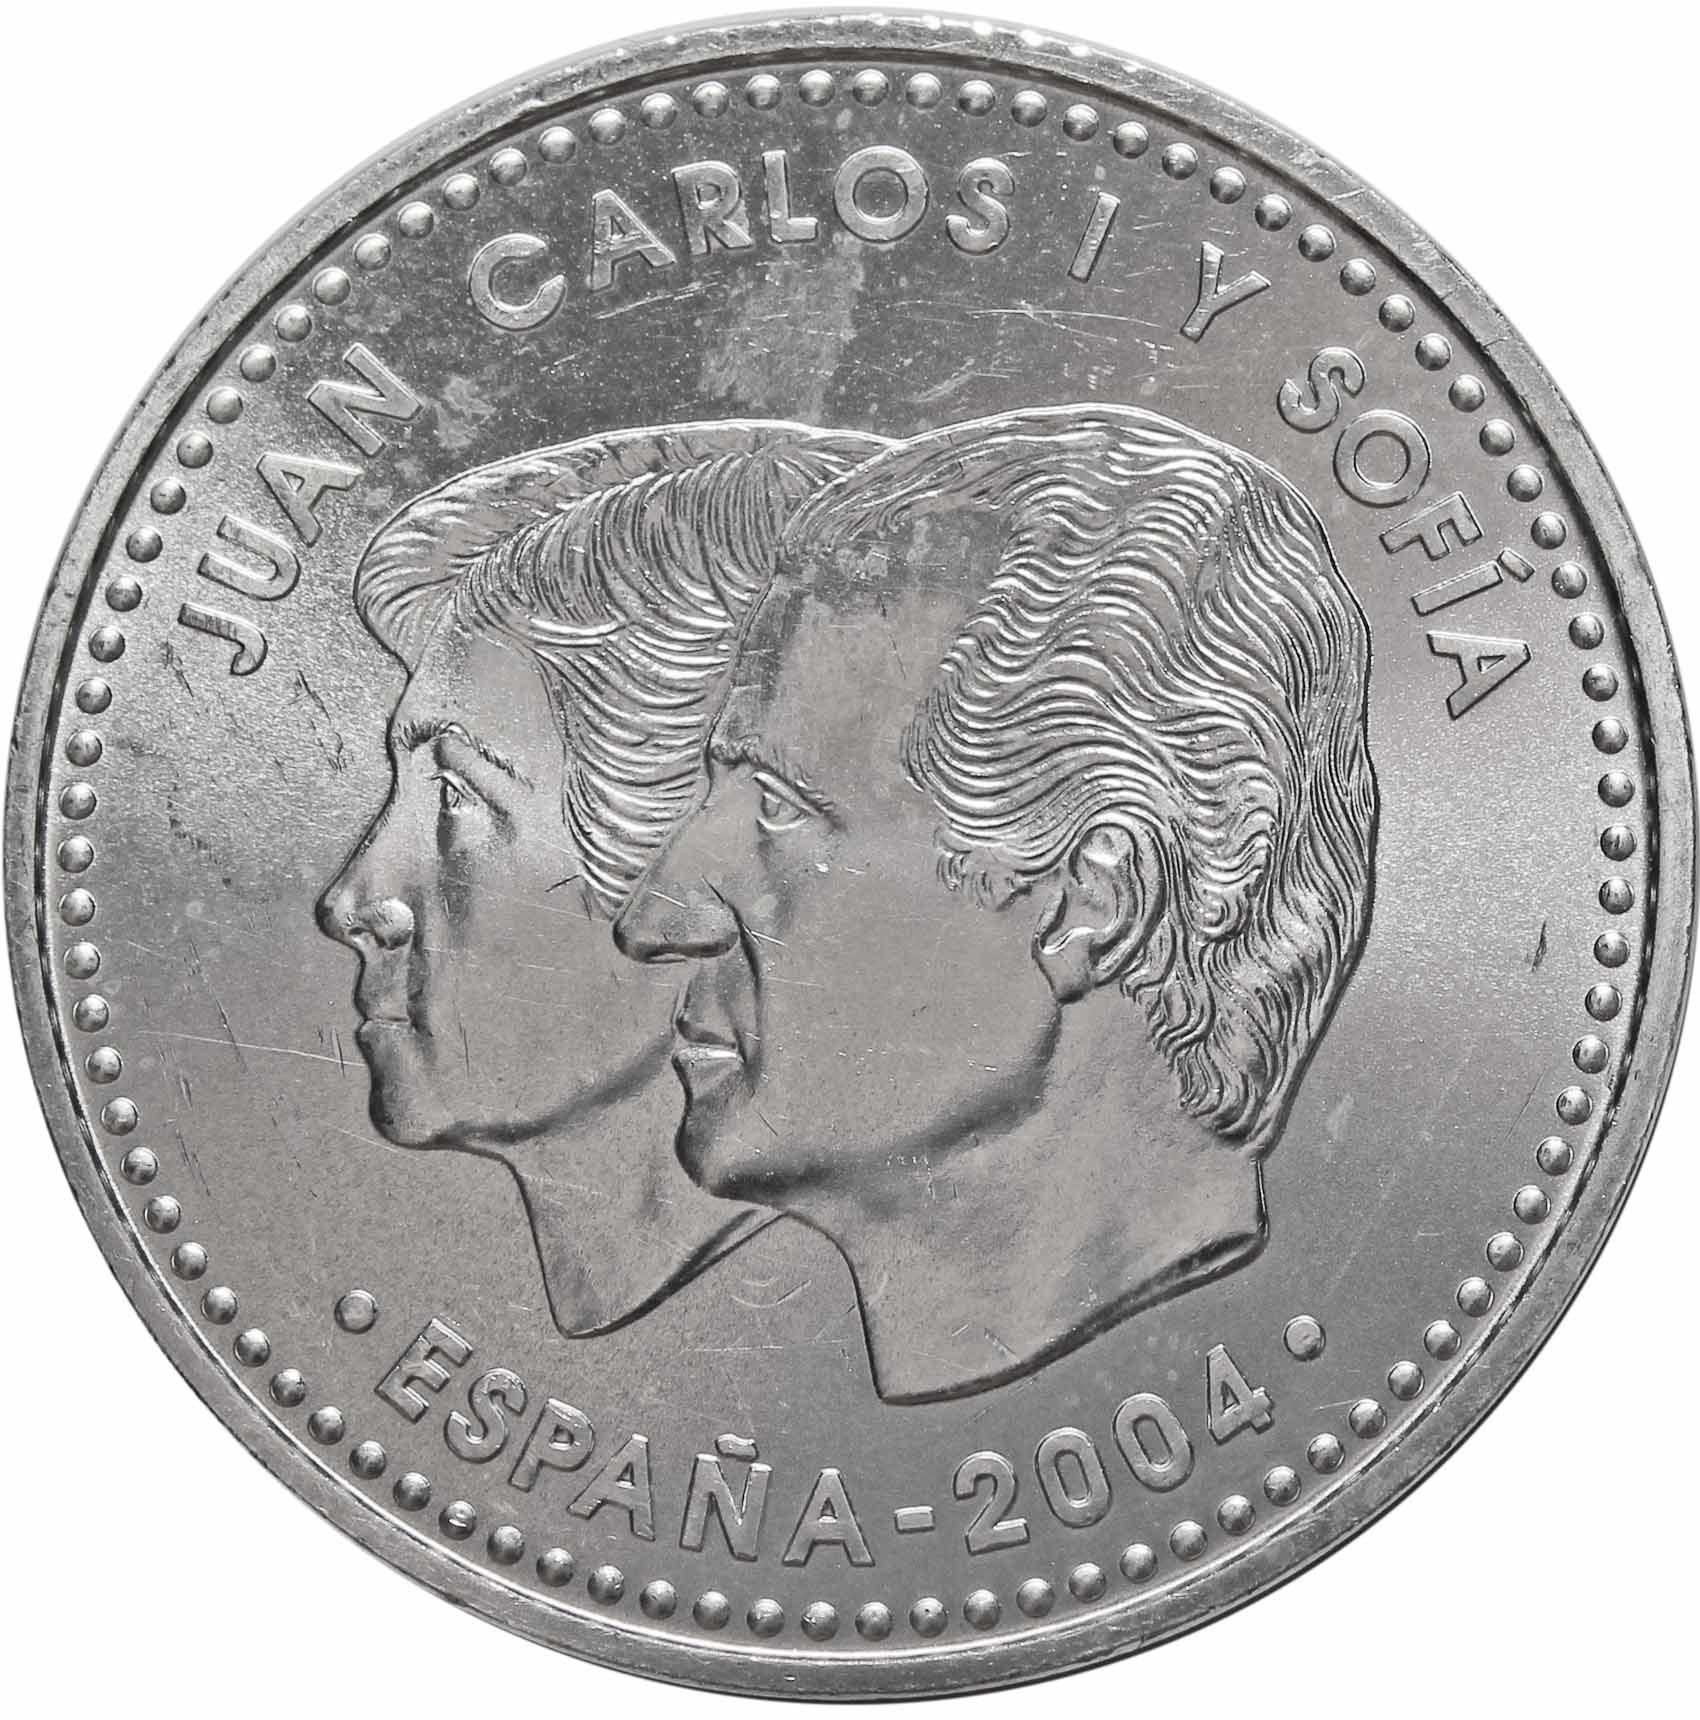 12 евро. 500 лет со дня смерти Изабеллы I. Испания. Серебро. 2004 г. AU